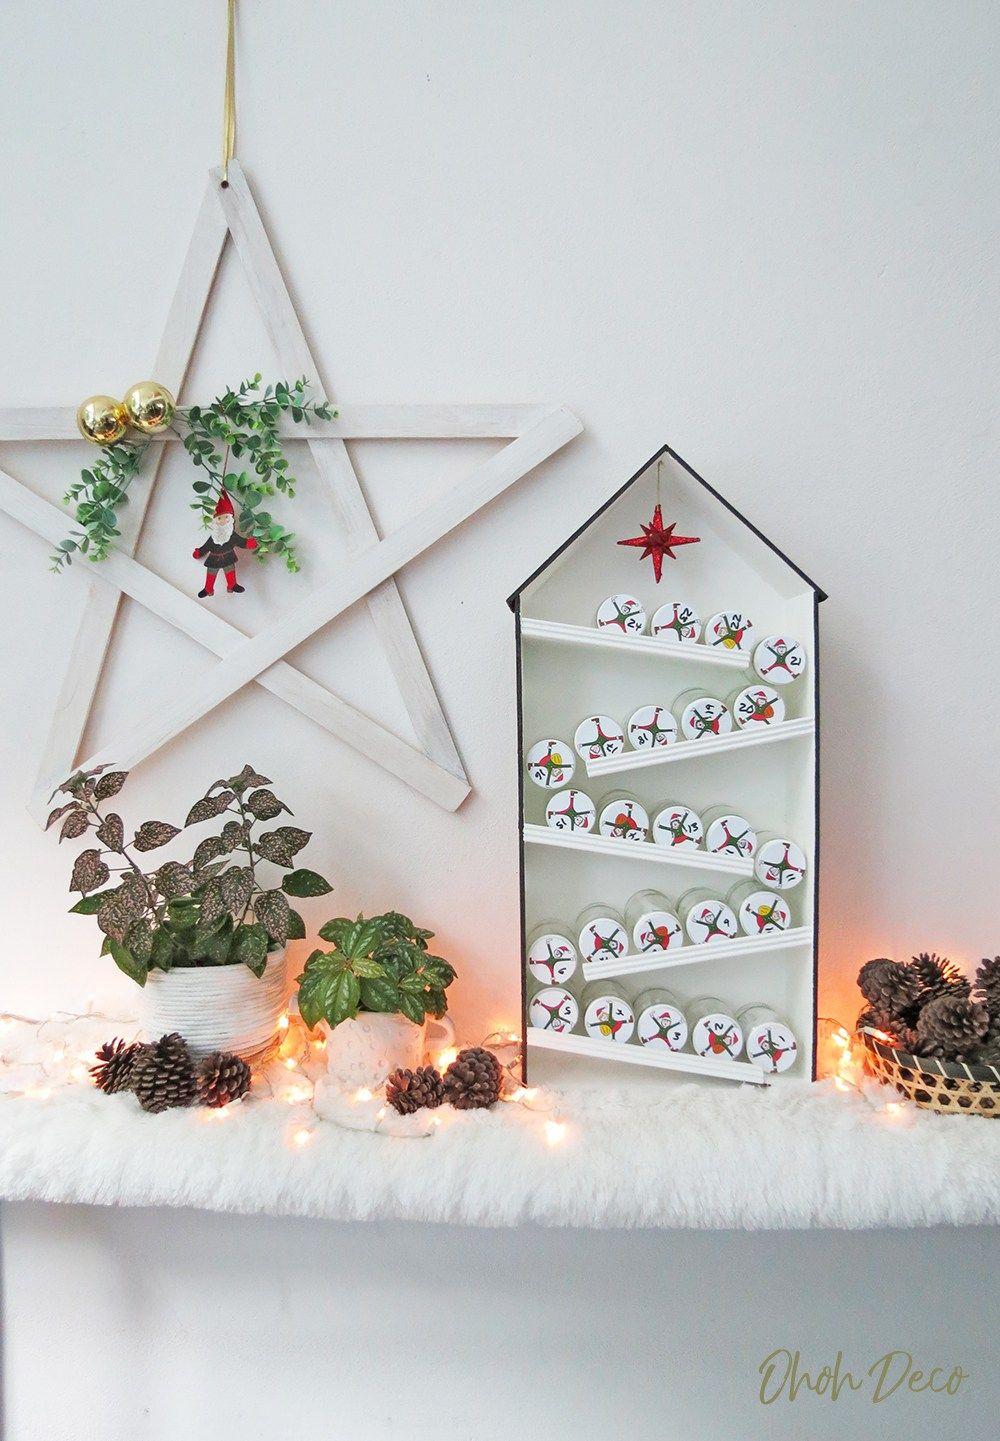 Diy Elves Advent Calendar Ohoh Deco Cool Advent Calendars Elf House Christmas Advent